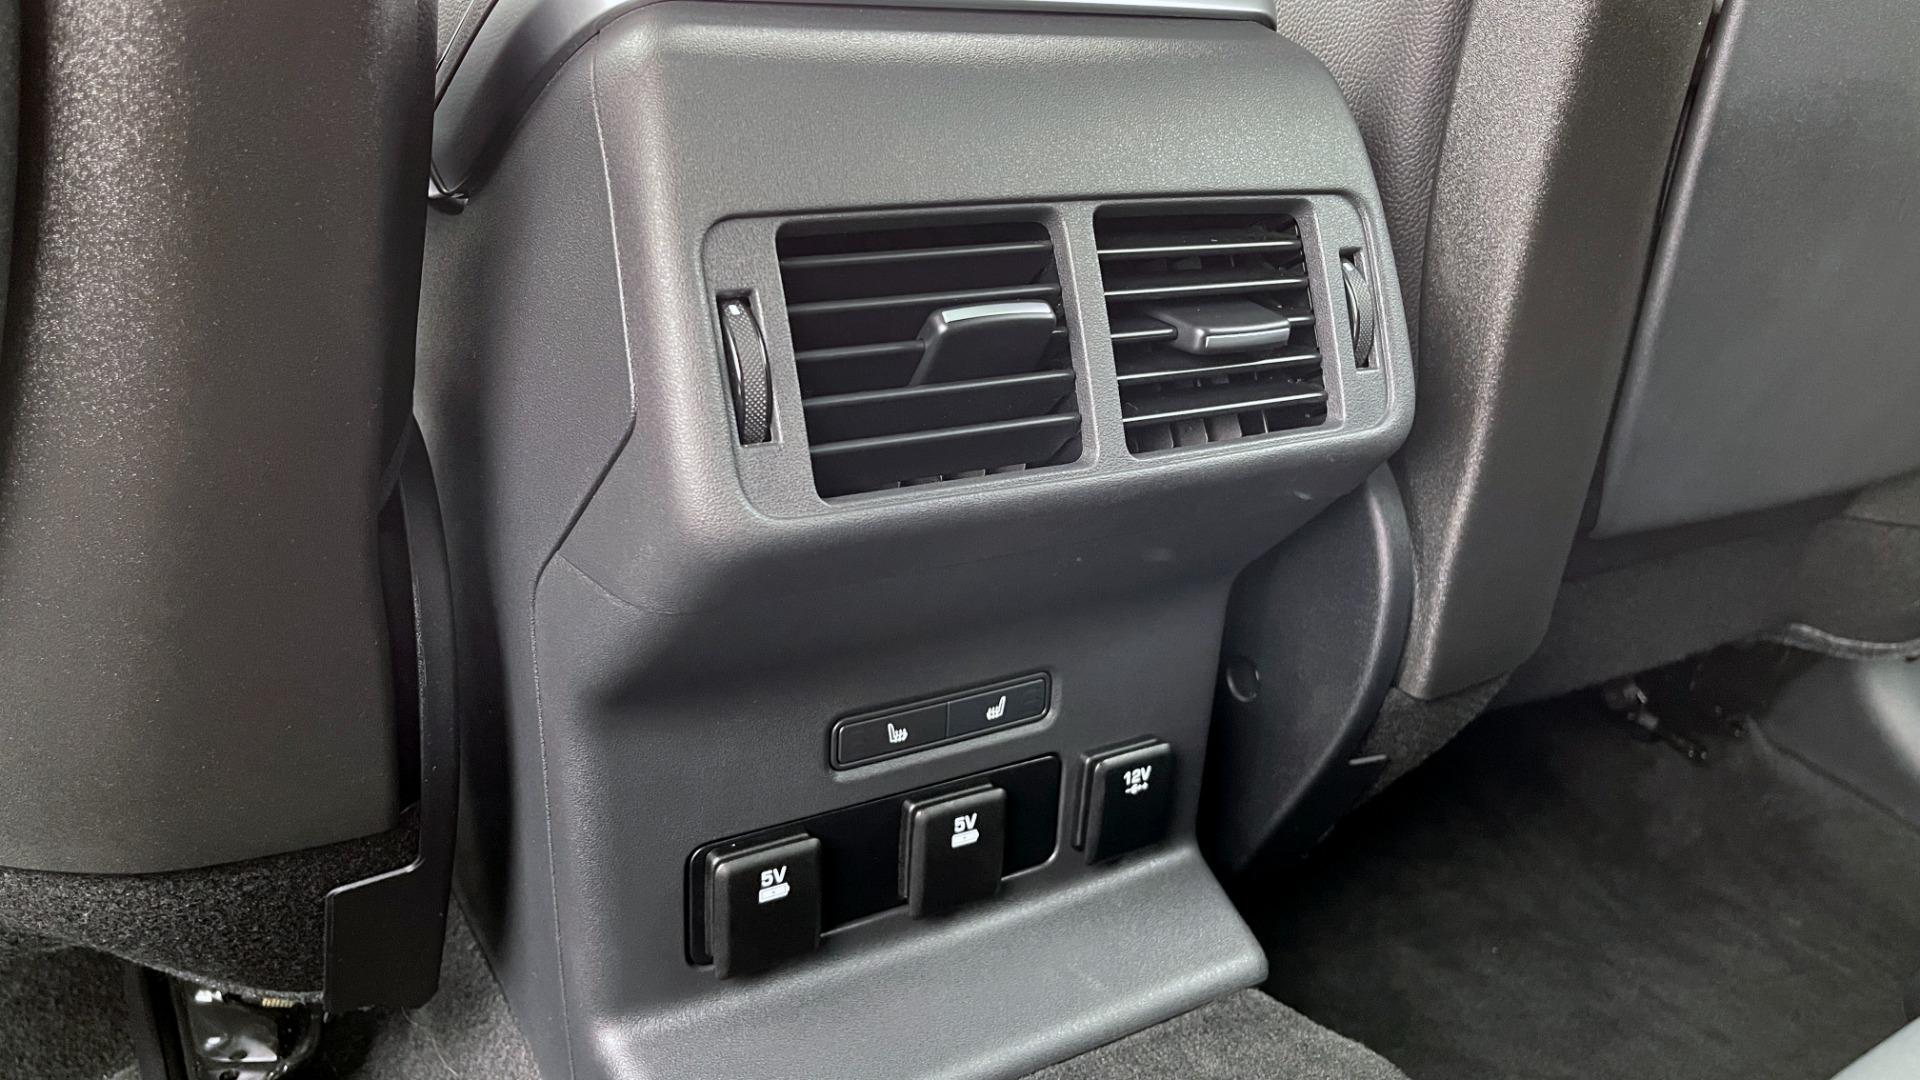 Used 2018 Land Rover RANGE ROVER VELAR R-DYNAMIC SE / NAV / PREM / MERIDIAN / SUNROOF / REARVIEW for sale $54,995 at Formula Imports in Charlotte NC 28227 54